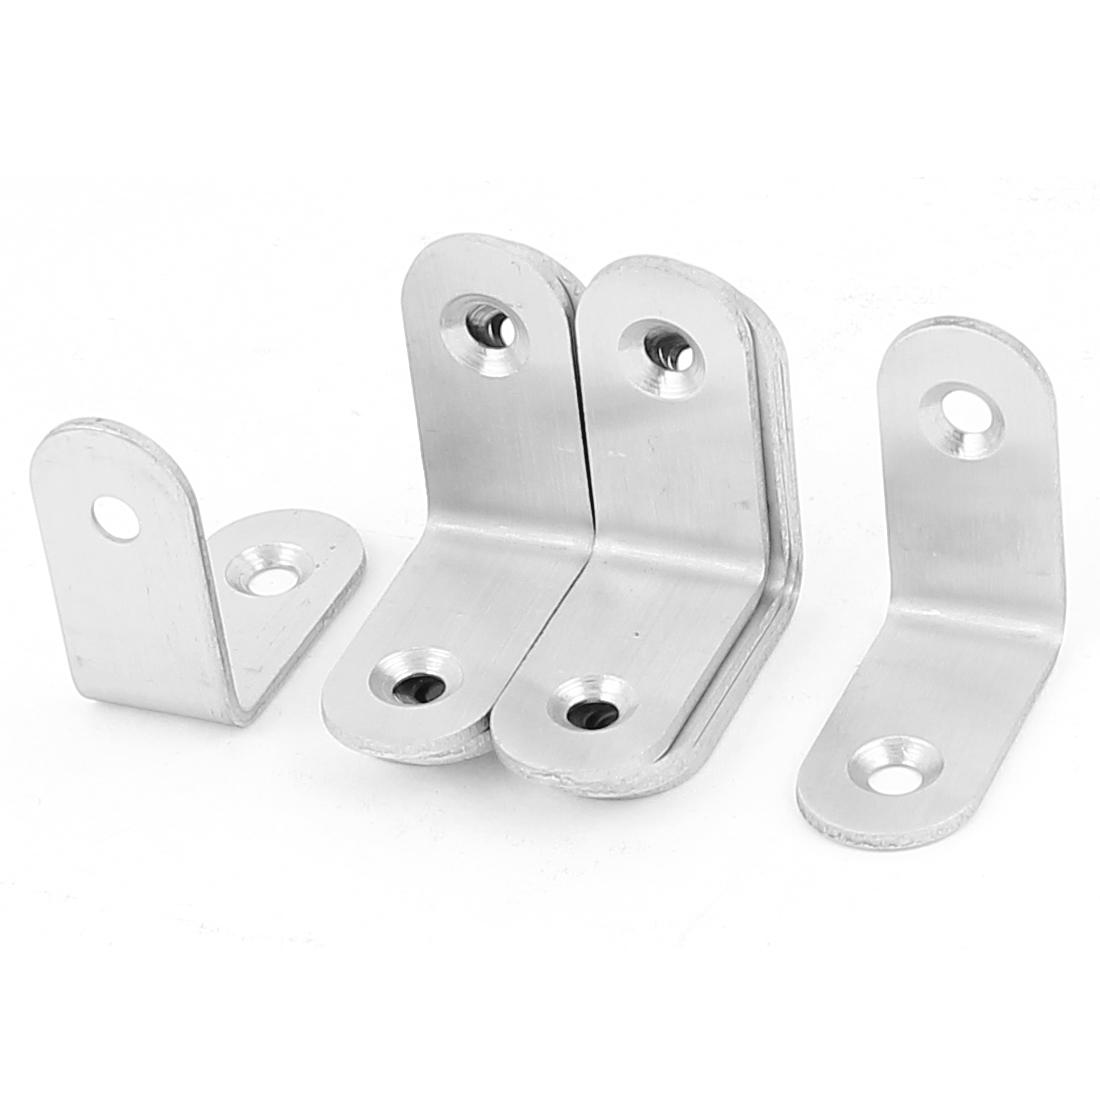 30mm x 30mm Shelf Support Corner Brace Joint Right Angle Metal Bracket 10Pcs